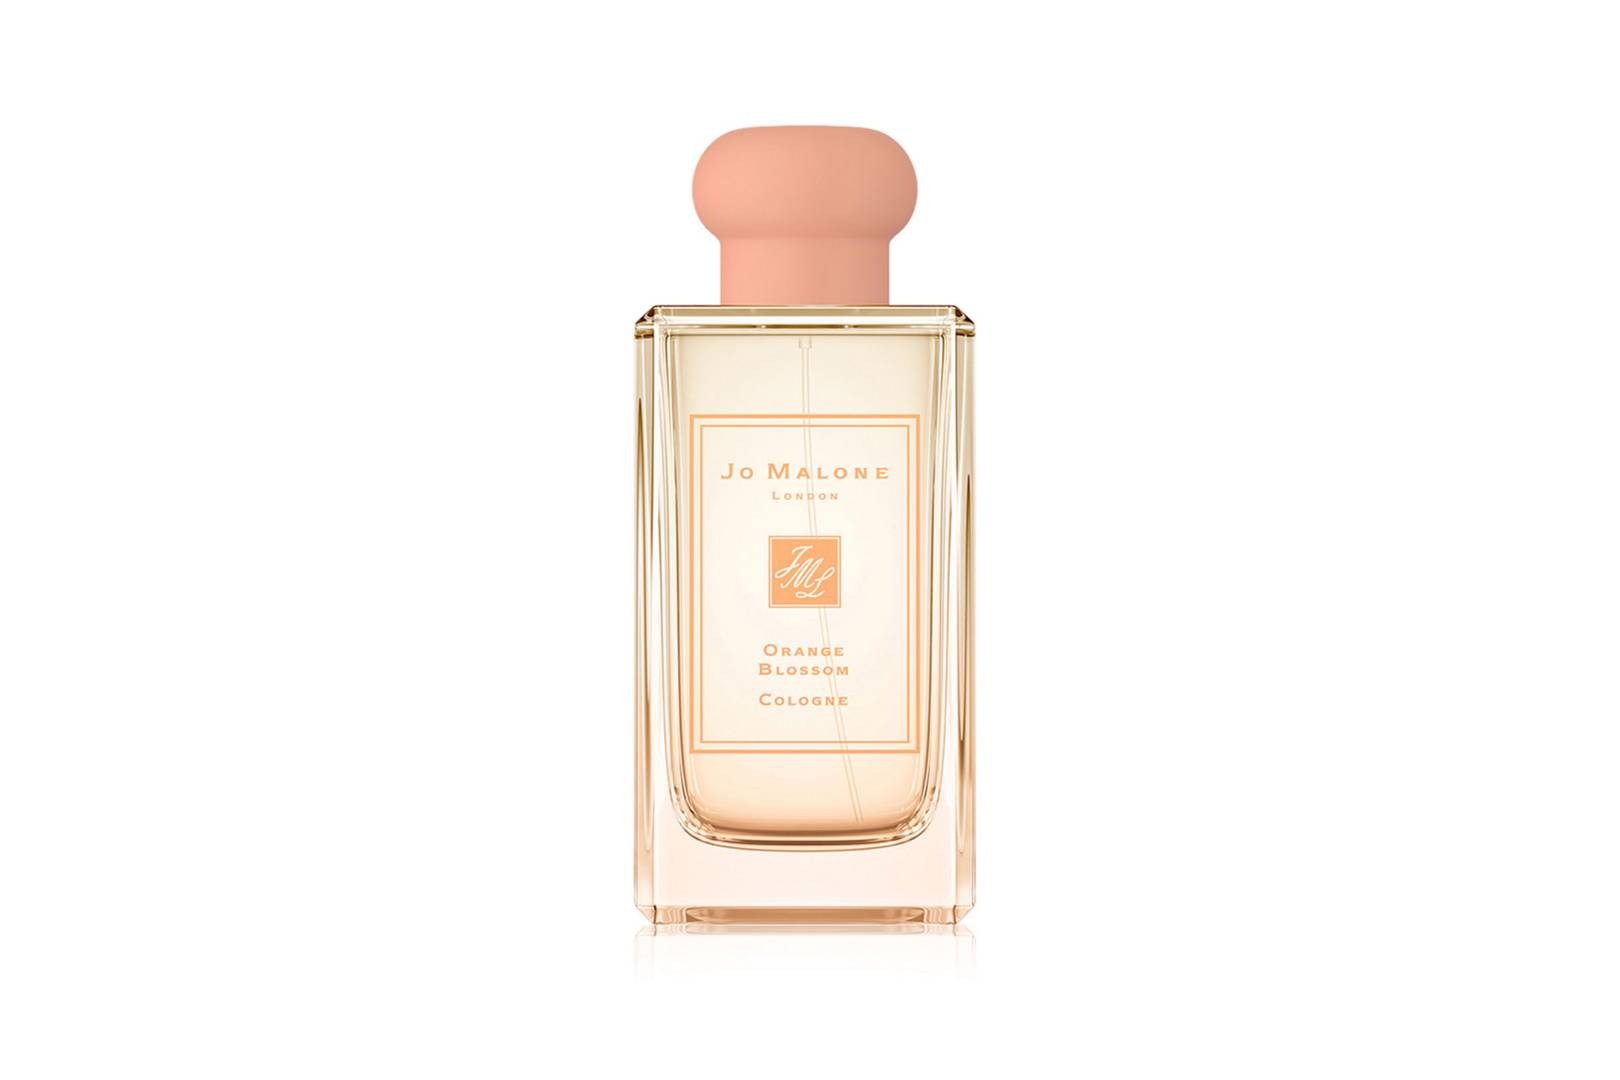 10 Best New Fragrances Perfumes 2019 Best Perfume For Women